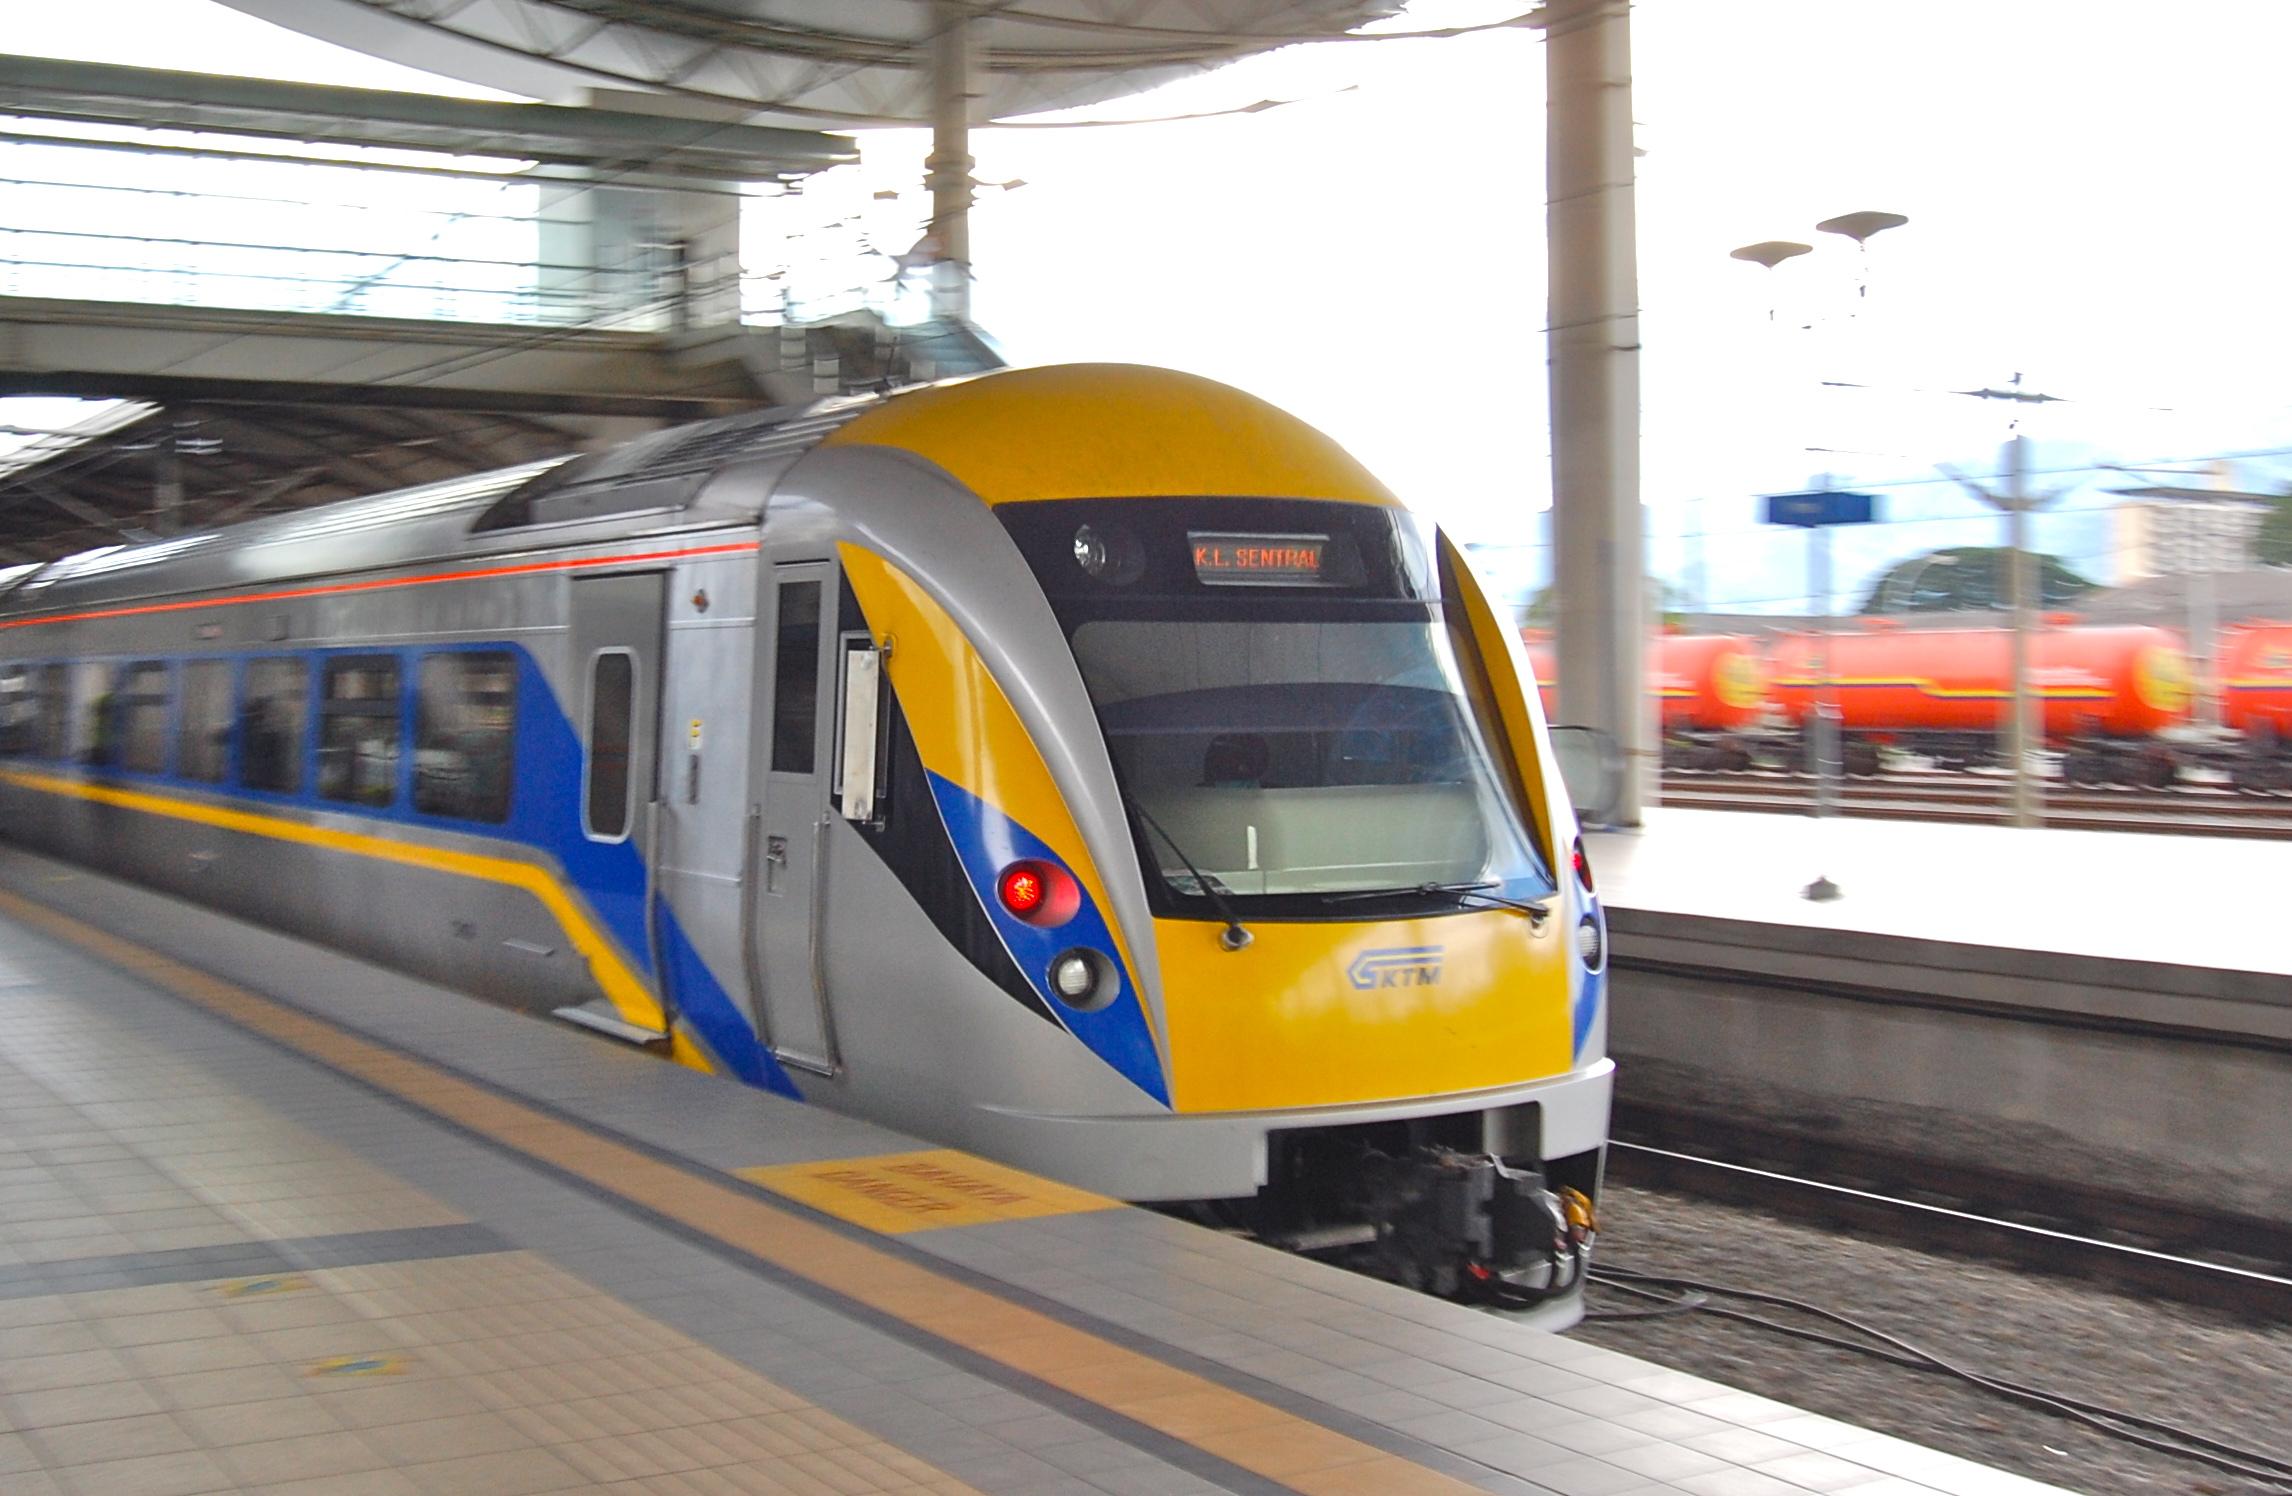 train-station-ktm-ipoh